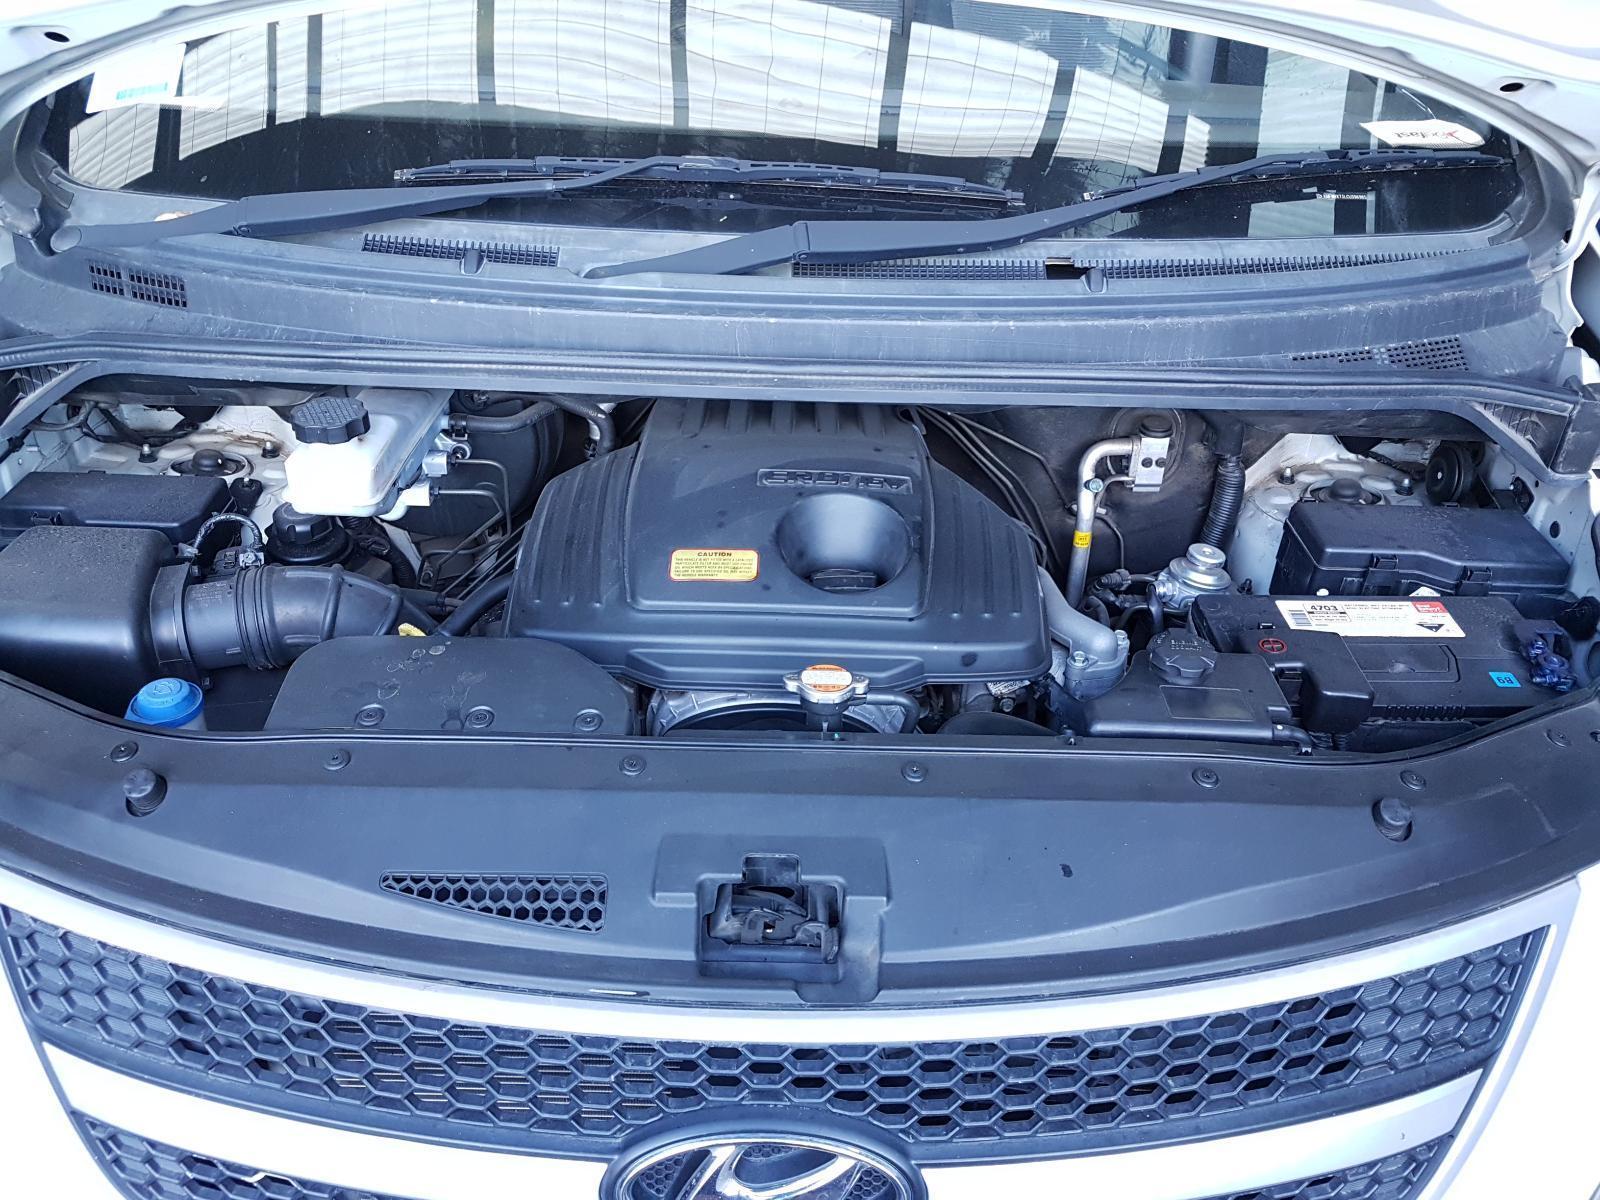 View Auto part Engine Hyundai Iload/imax 2011